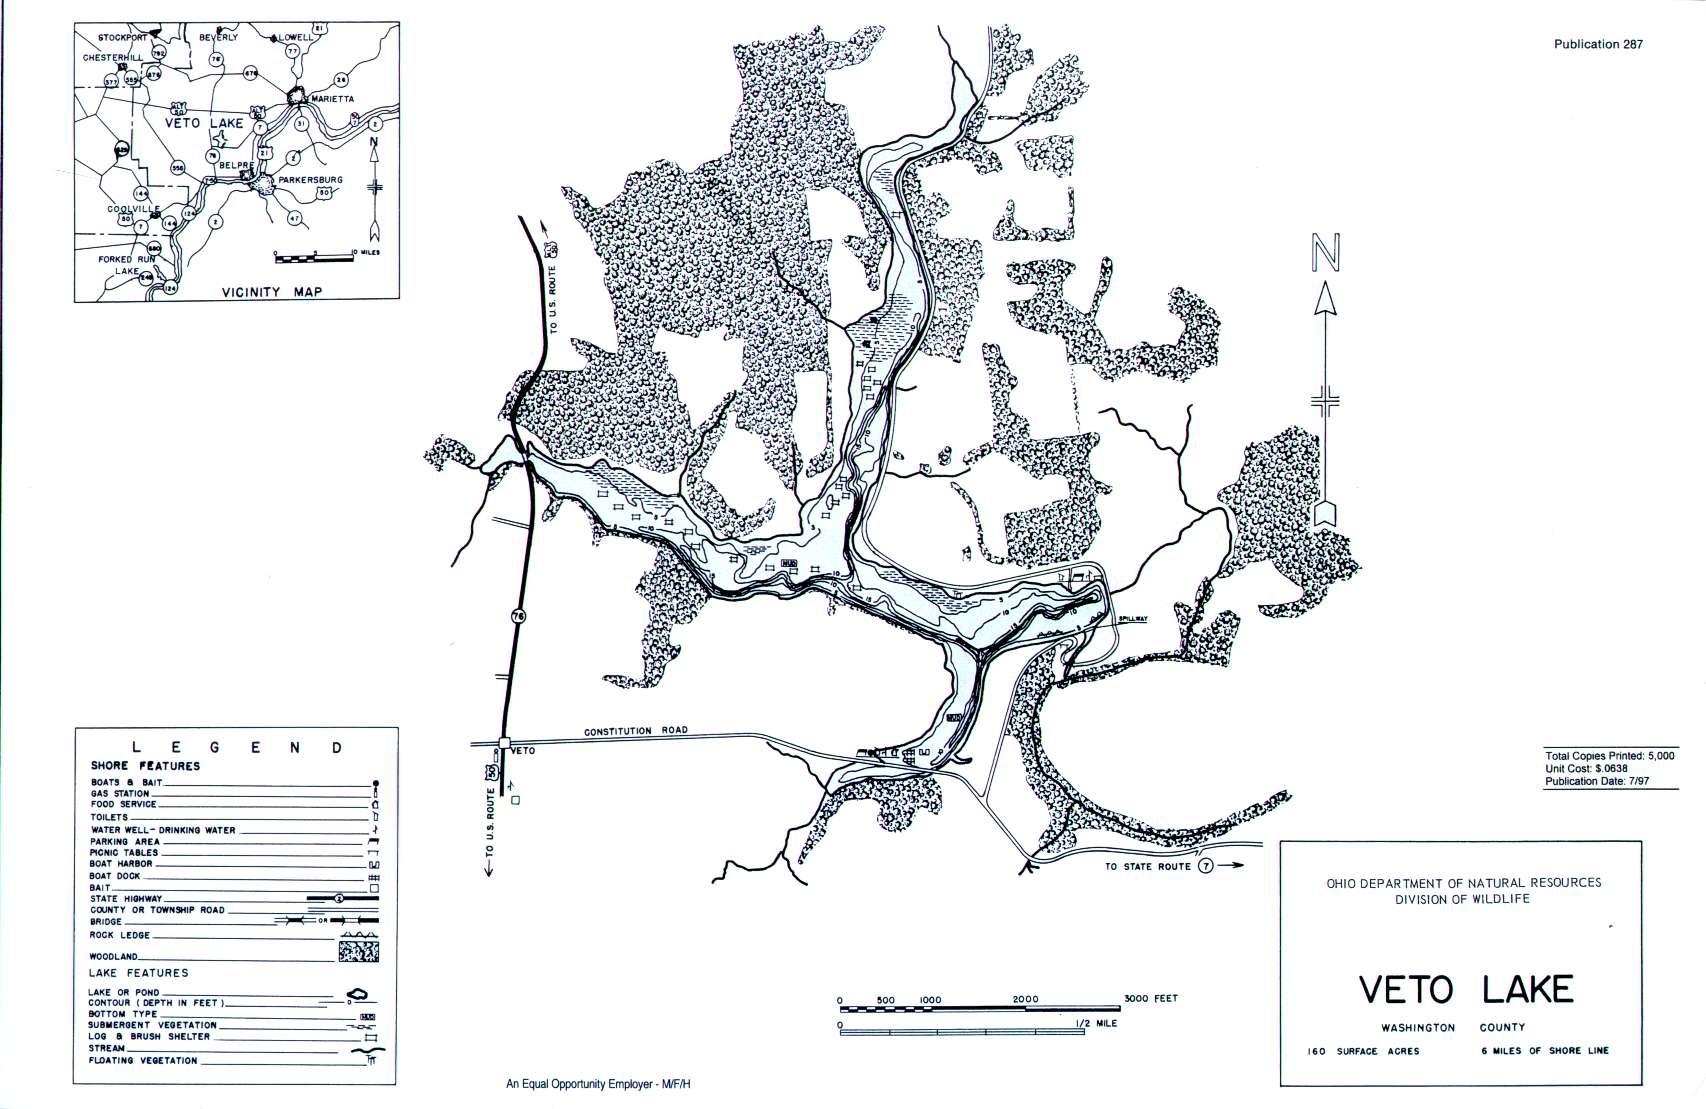 Veto Lake Fishing Map - GoFishOhio